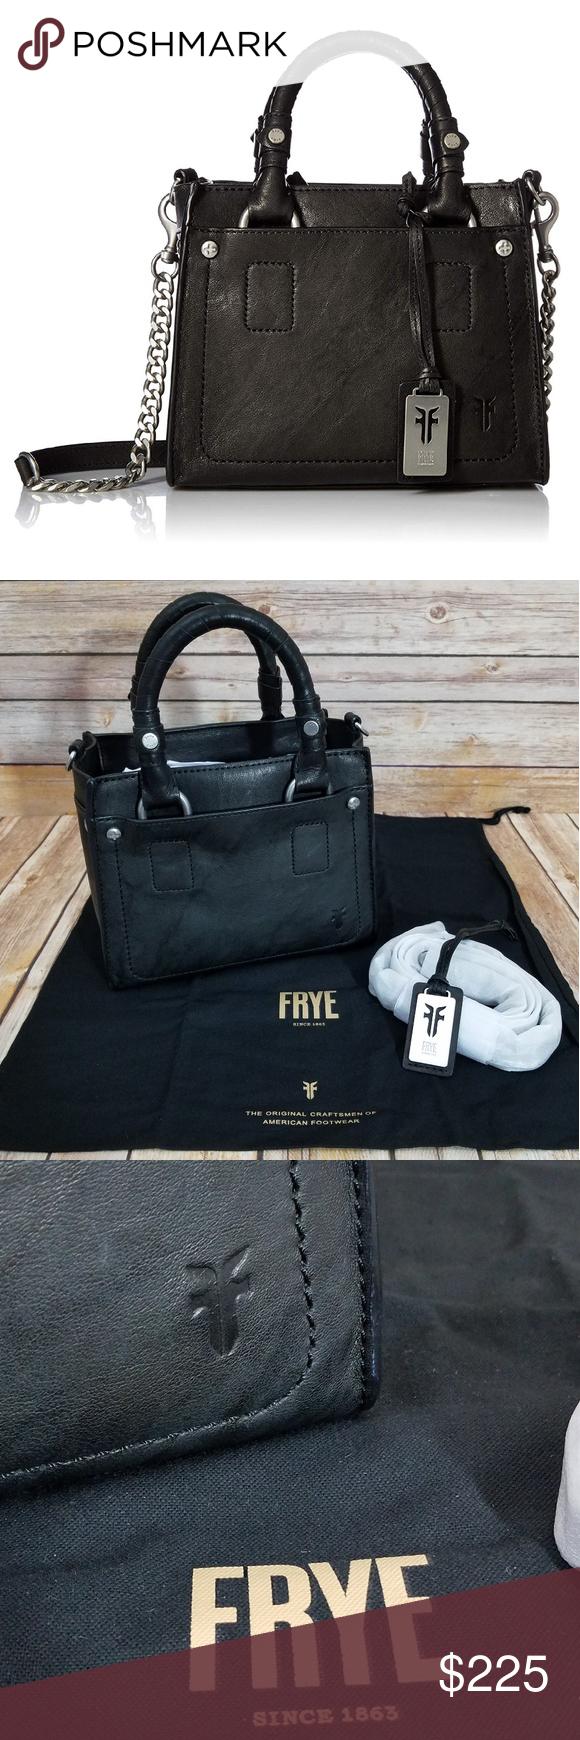 811555edc NWOT Frye Demi Mini Crossbody Satchel Bag Purse In typical Frye fashion-a  beautiful,